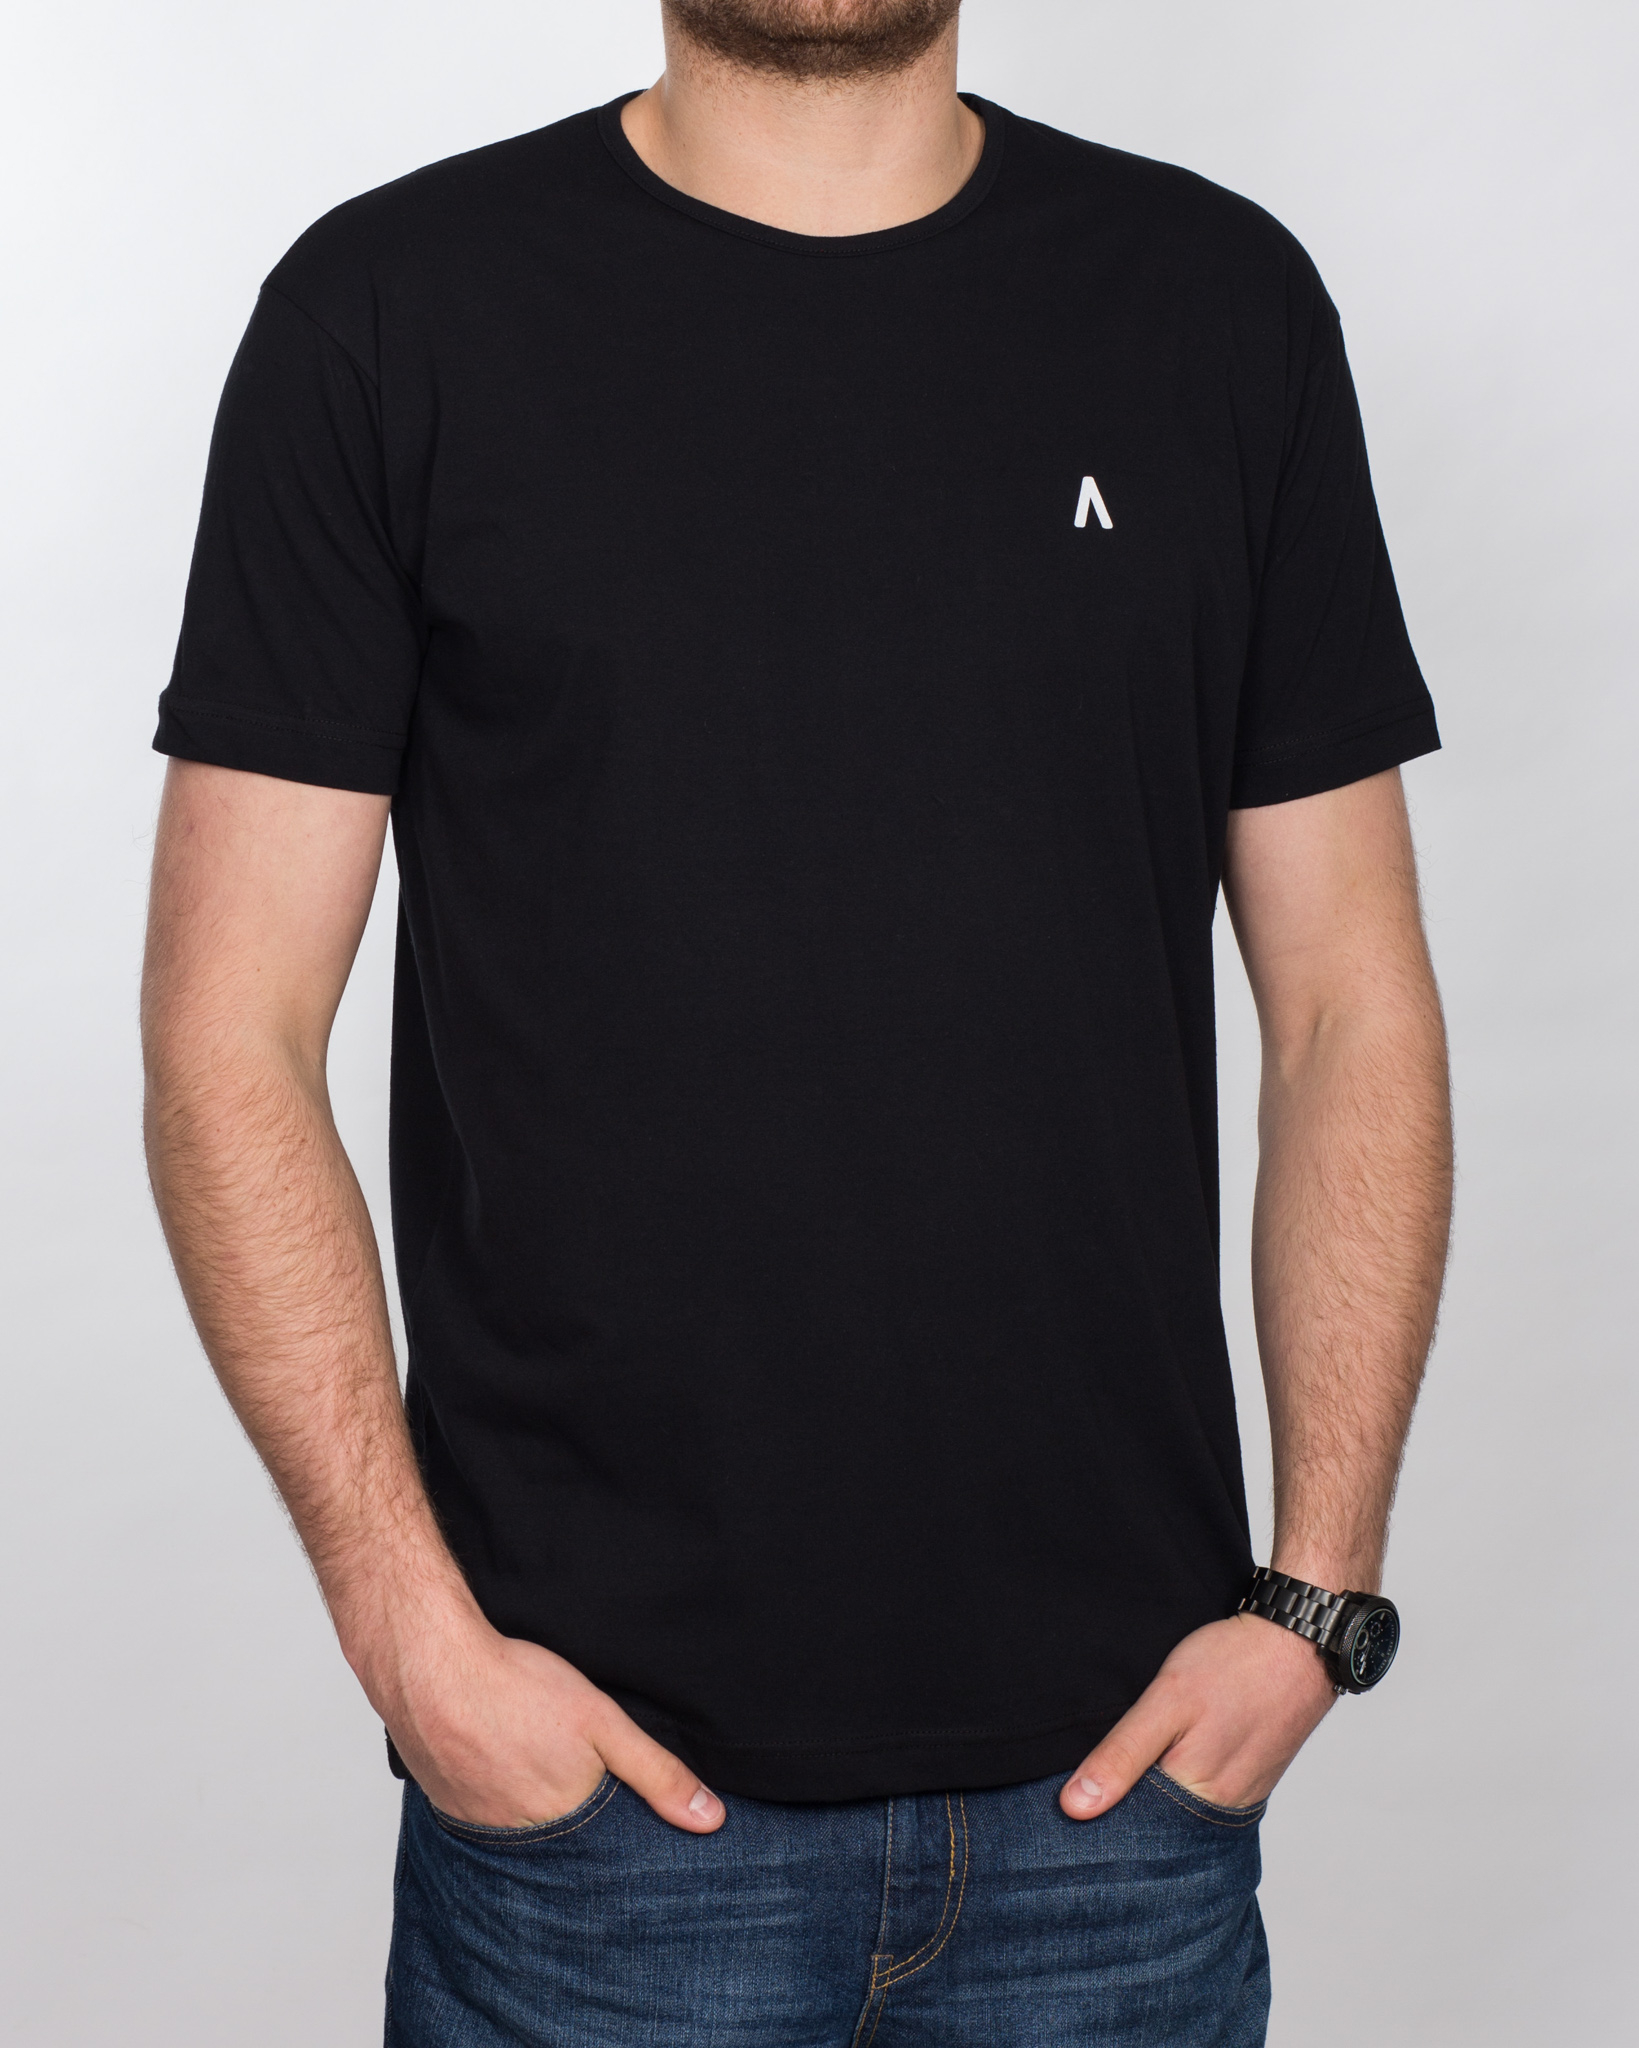 2t Tall T-Shirt (black logo)